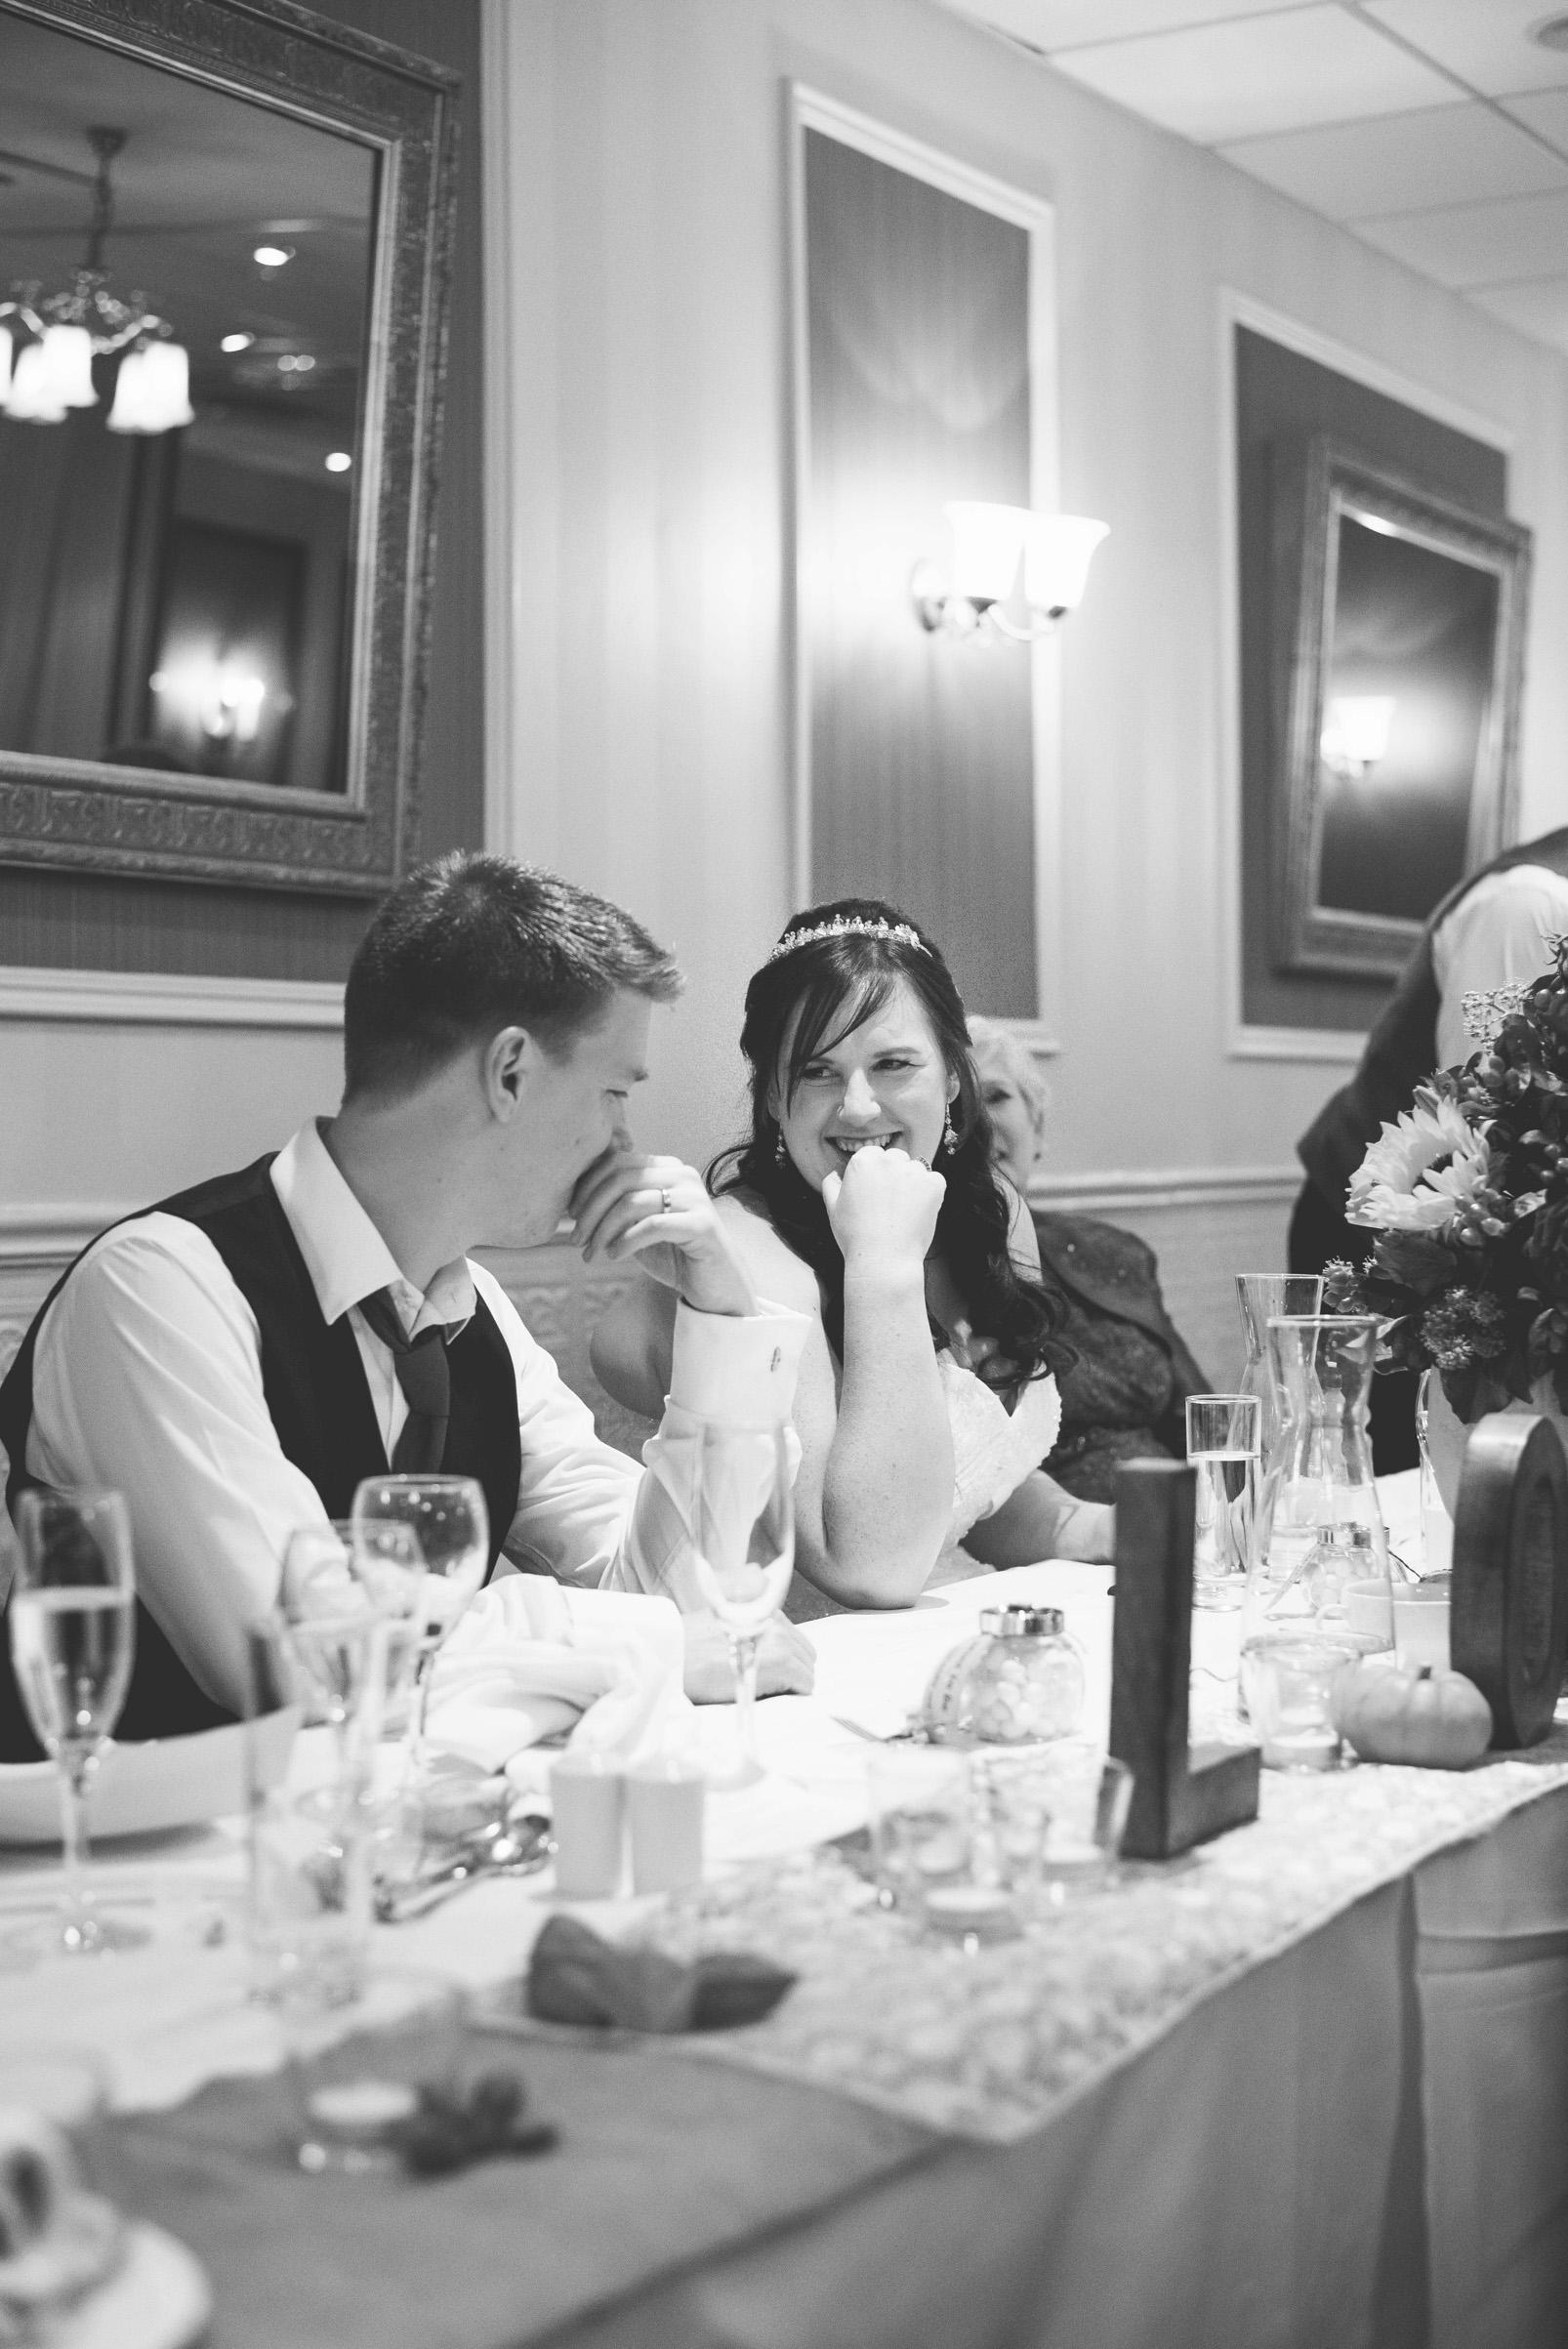 The+Fairlawns+wedding+Aldridge+StLukes+Church-189.jpg